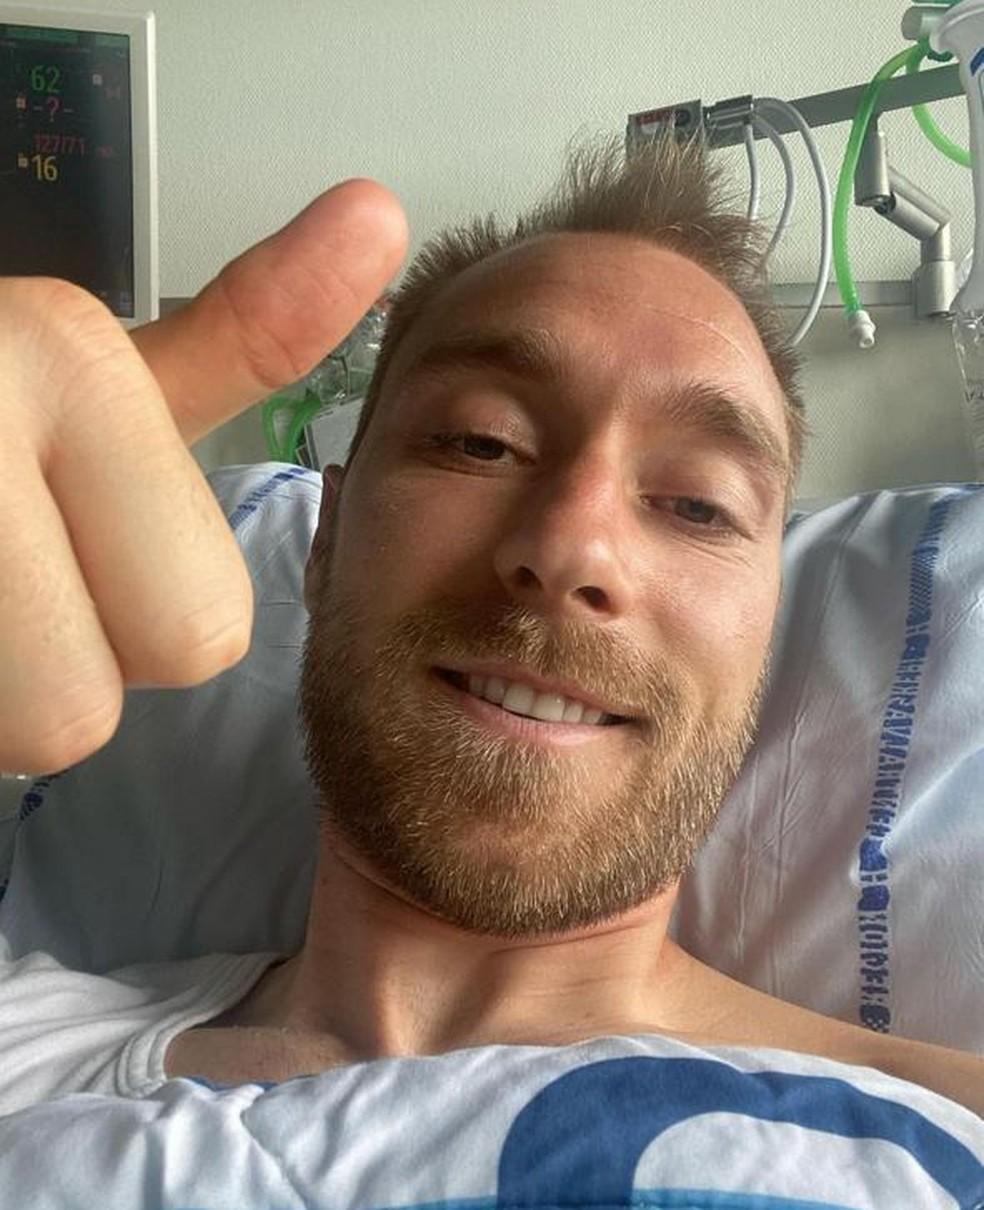 Christian Eriksen posta foto e agradece carinho recebido após mal súbito